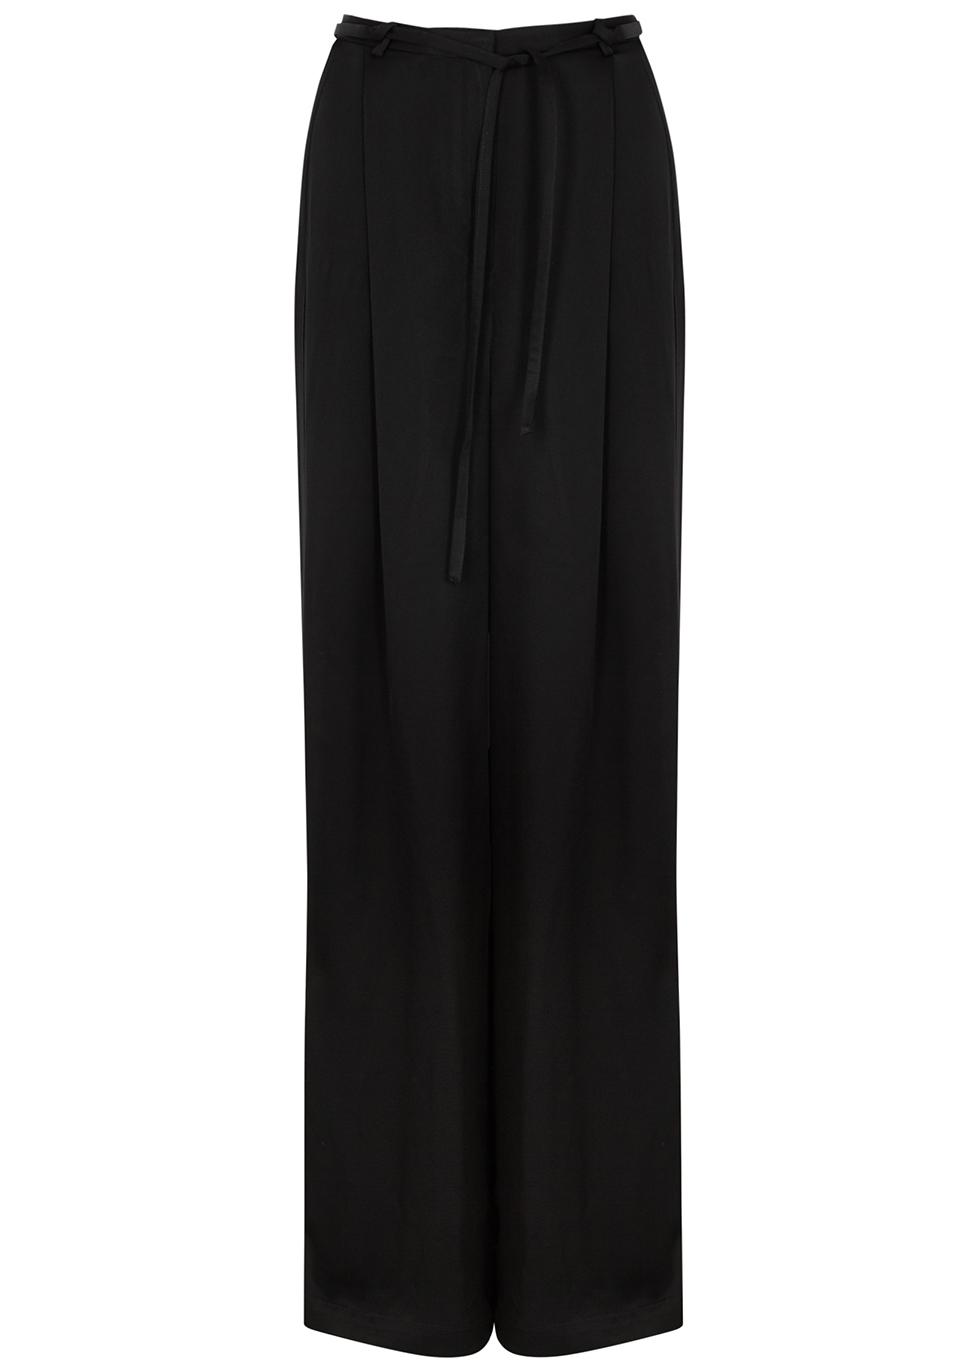 Tandin black wide-leg satin trousers